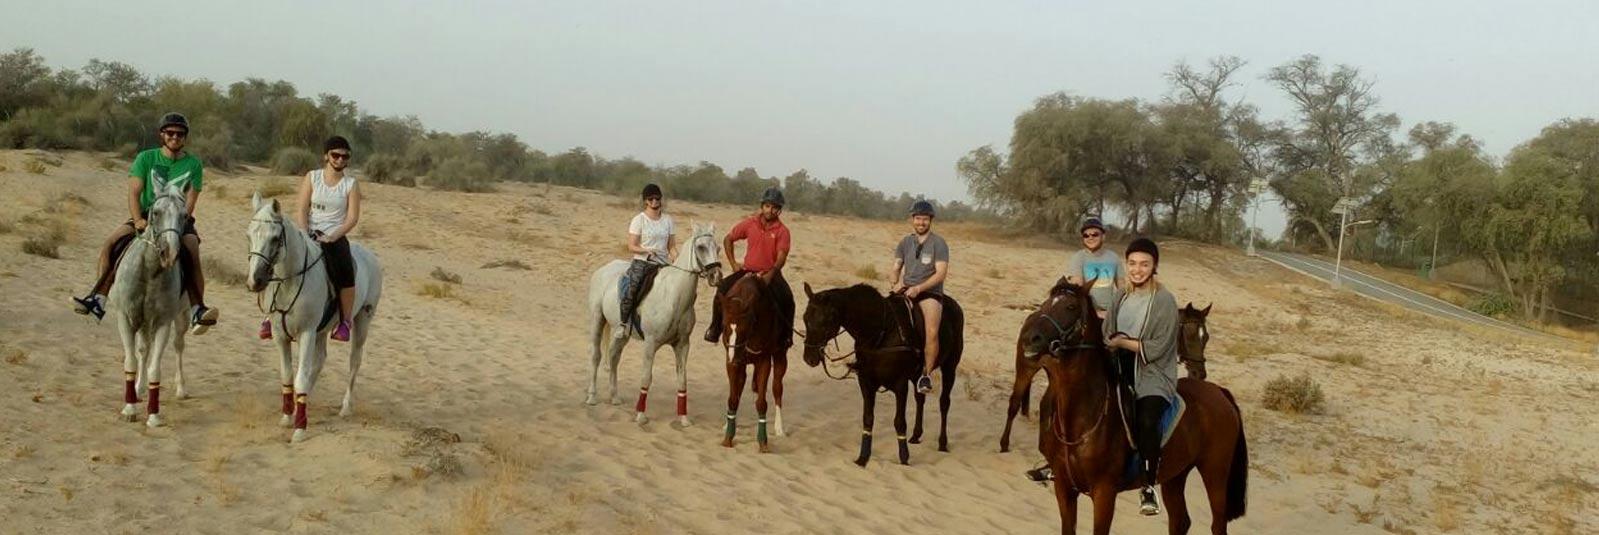 full-moon-horse-back-riding